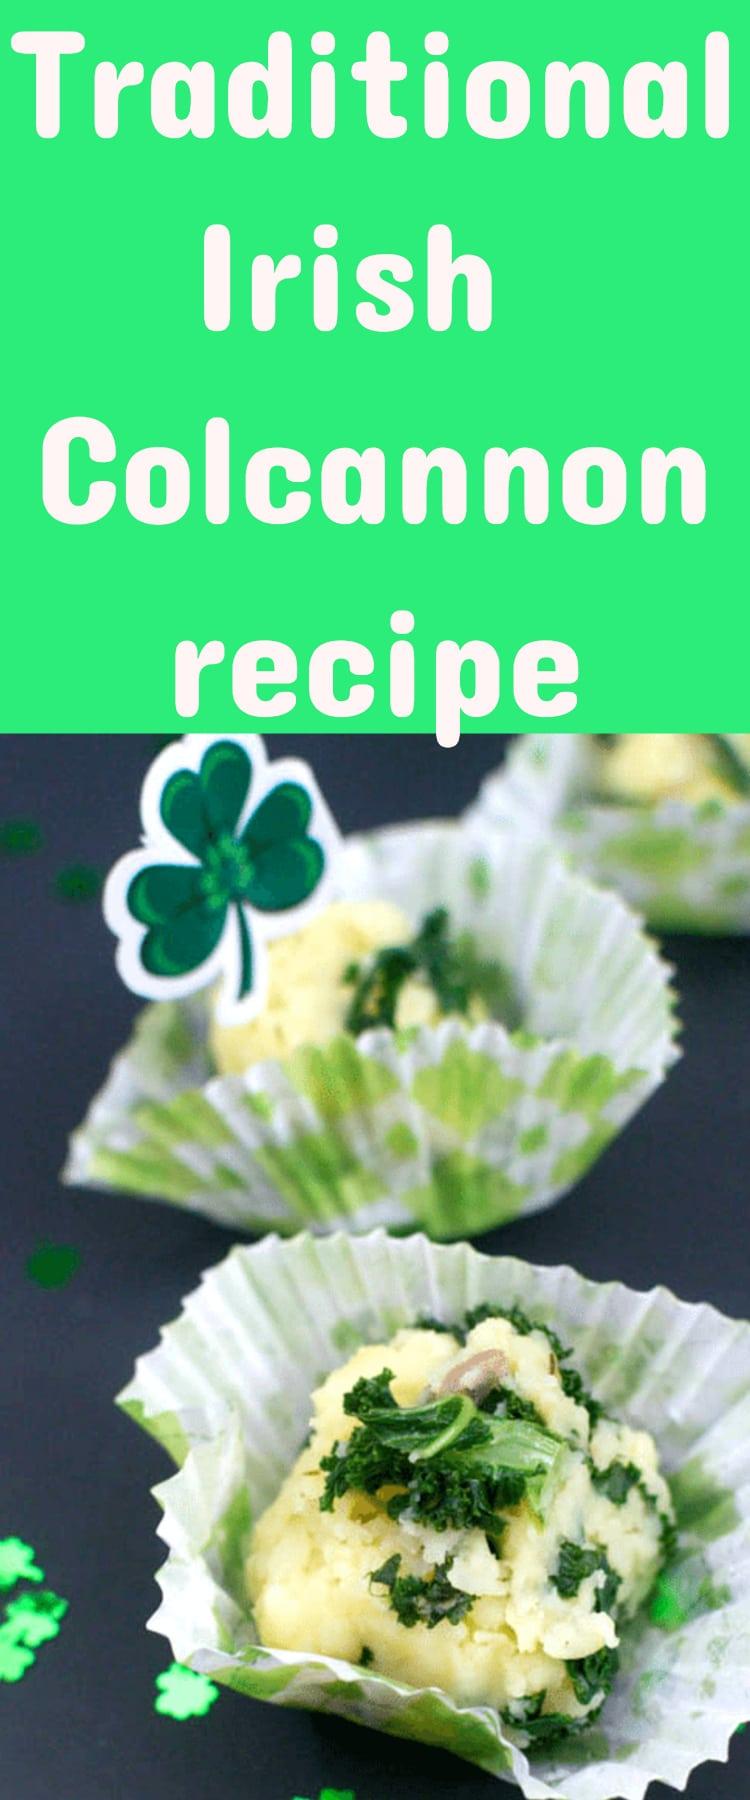 Irish recipes / recipes for st. patrick's day / colcannon / irish colcannon / potatoes / kale and potatoes #stpatricksday #irish via @clarkscondensed